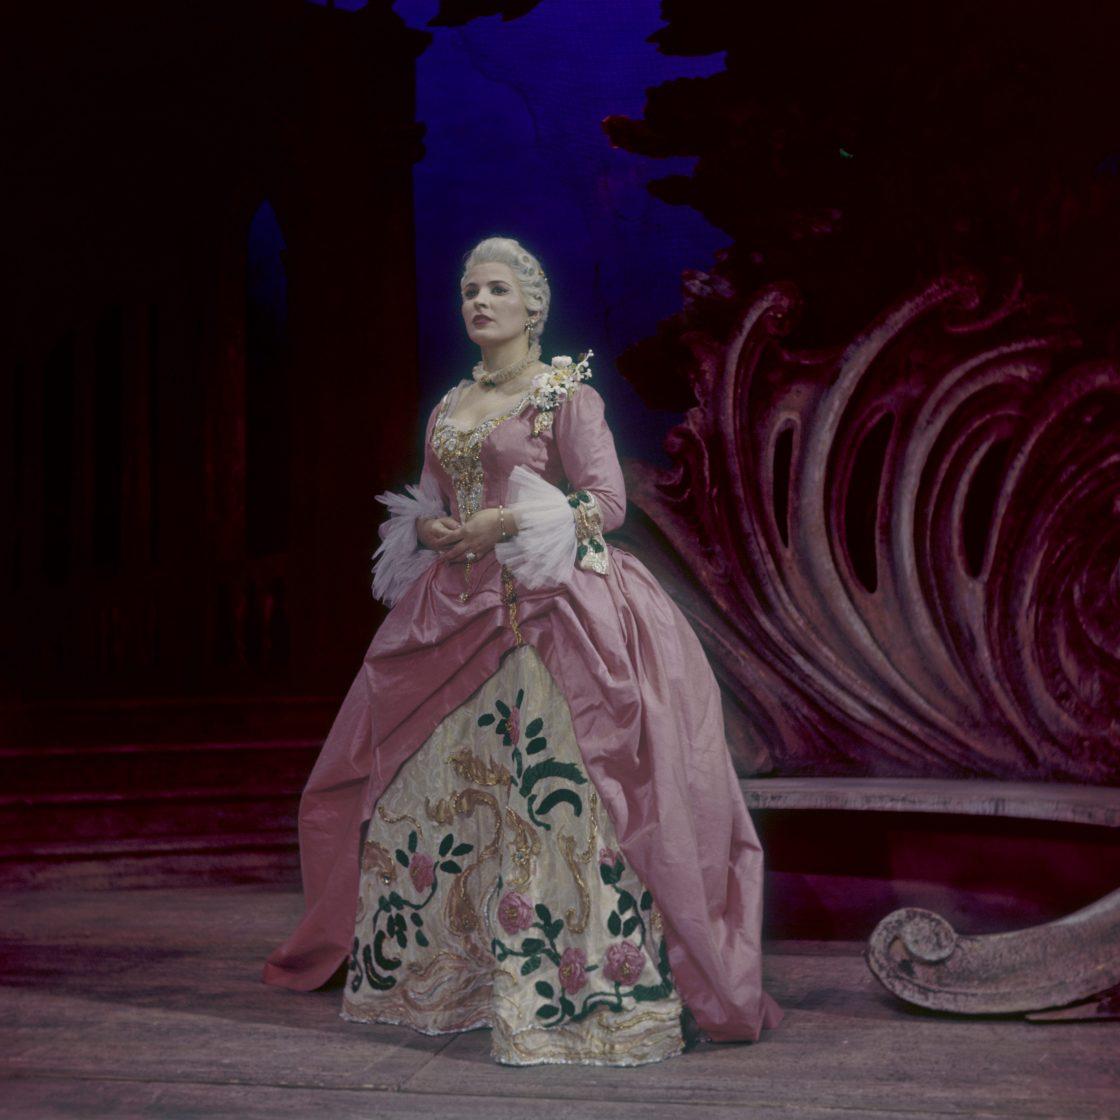 Pilar Lorengar as The Countess, Le nozze di Figaro,1958